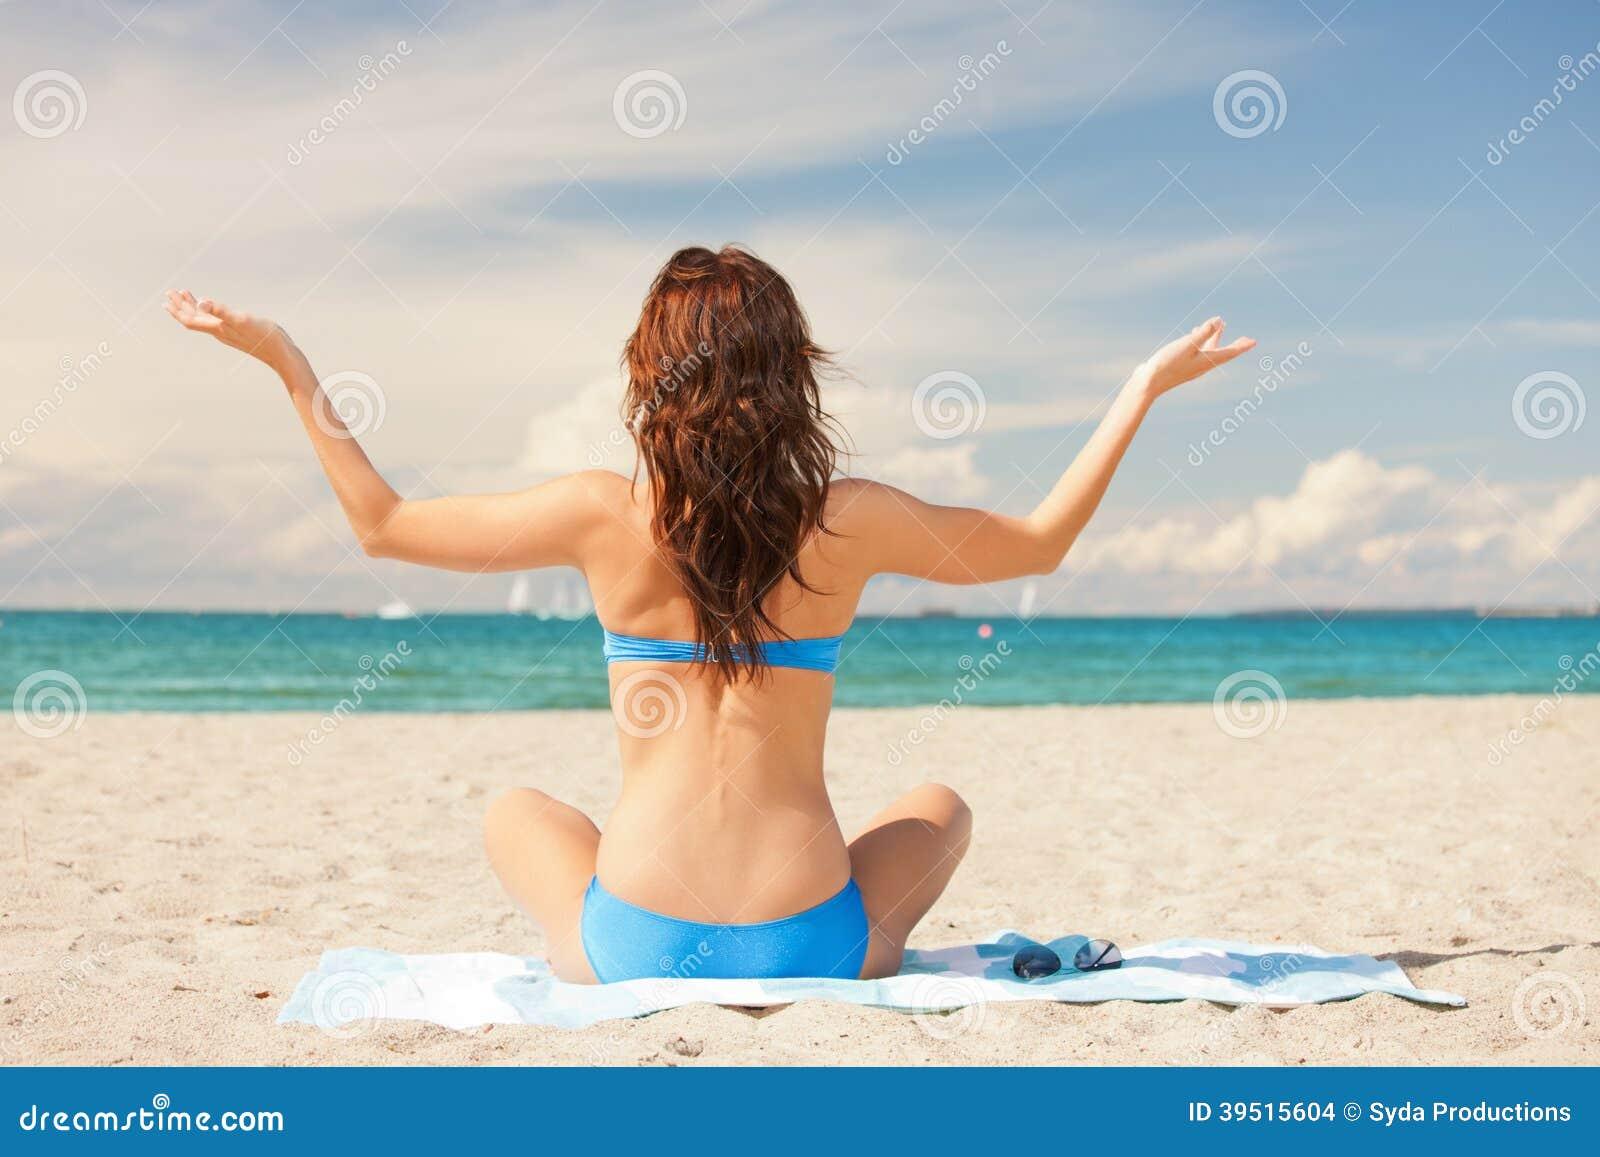 Woman practicing yoga lotus pose on the beach